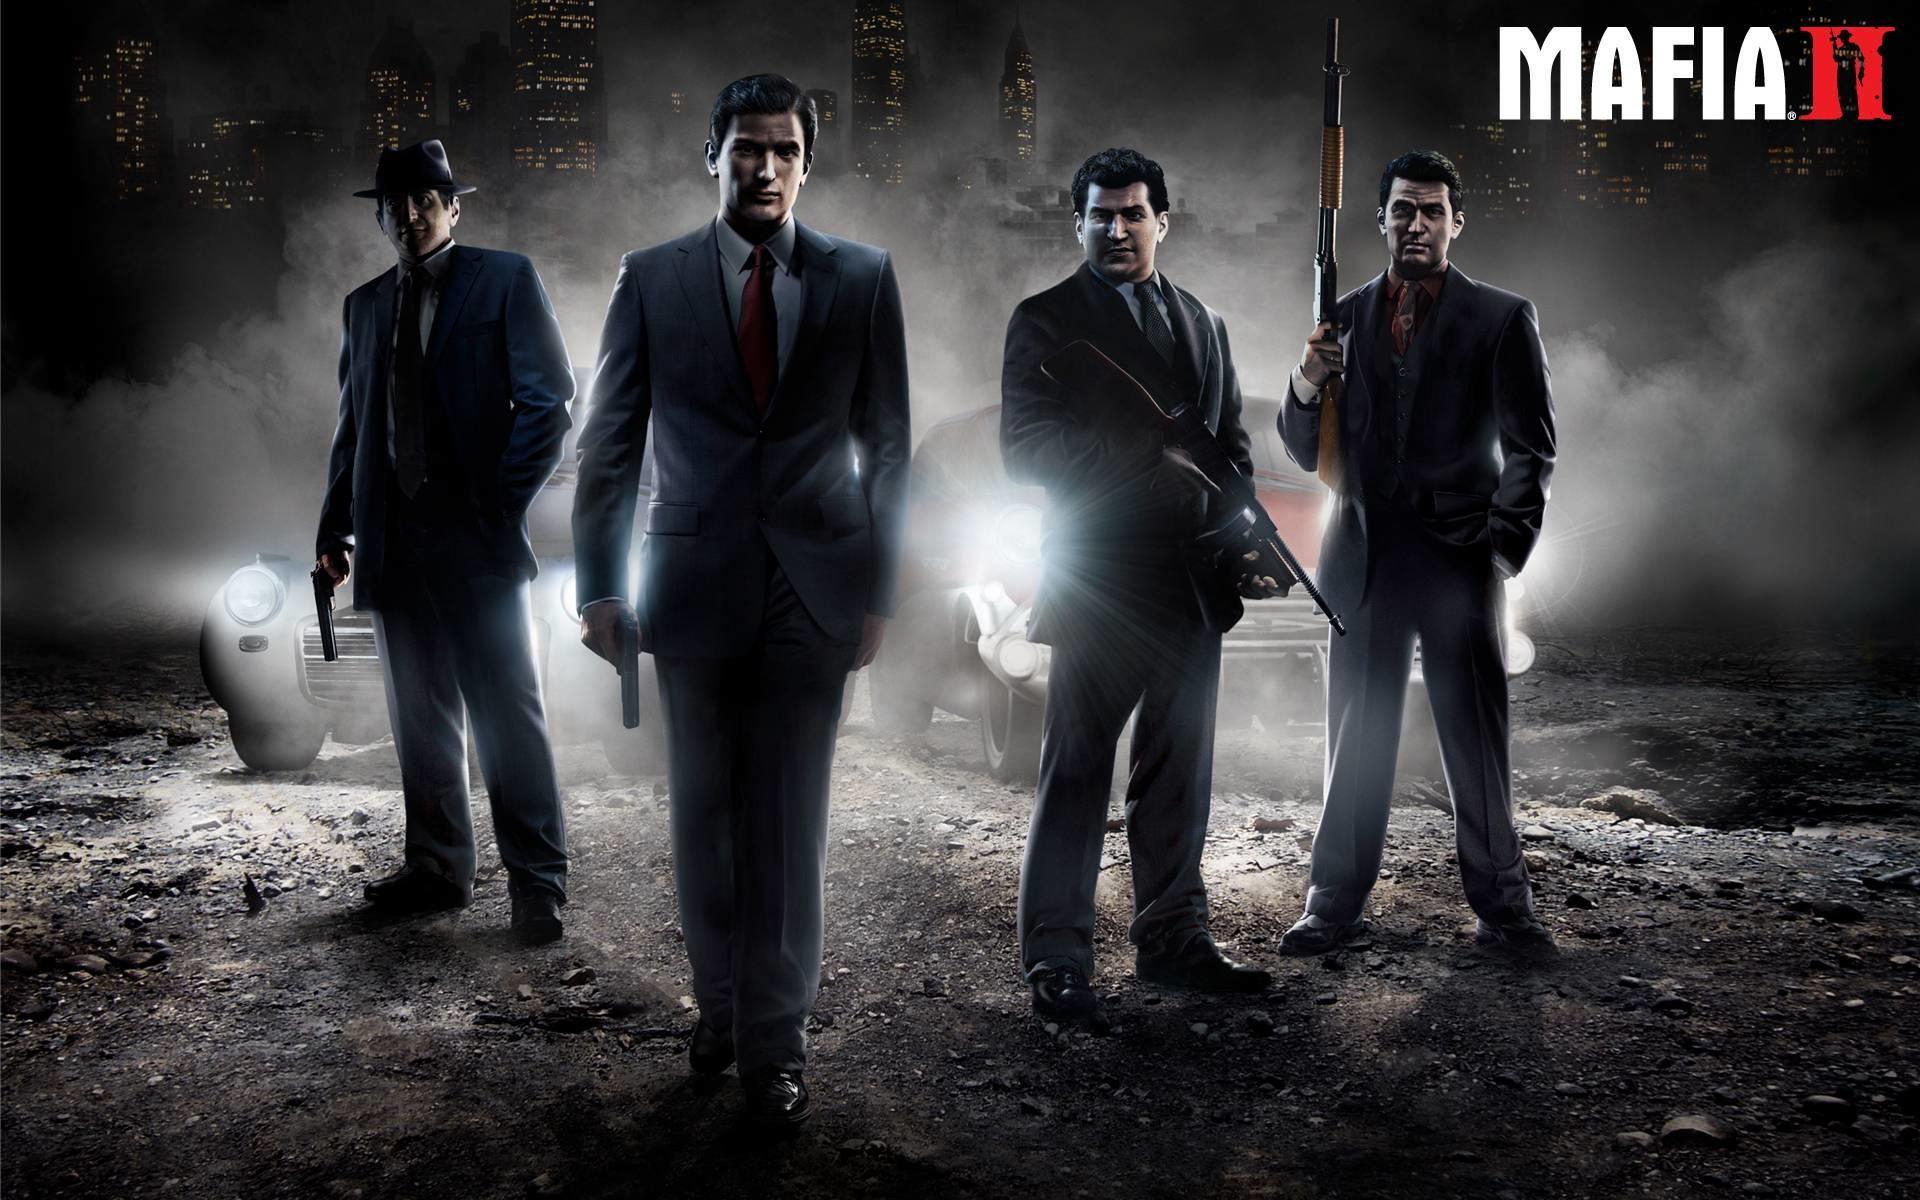 Most Downloaded Mafia Wallpapers – Full HD wallpaper search